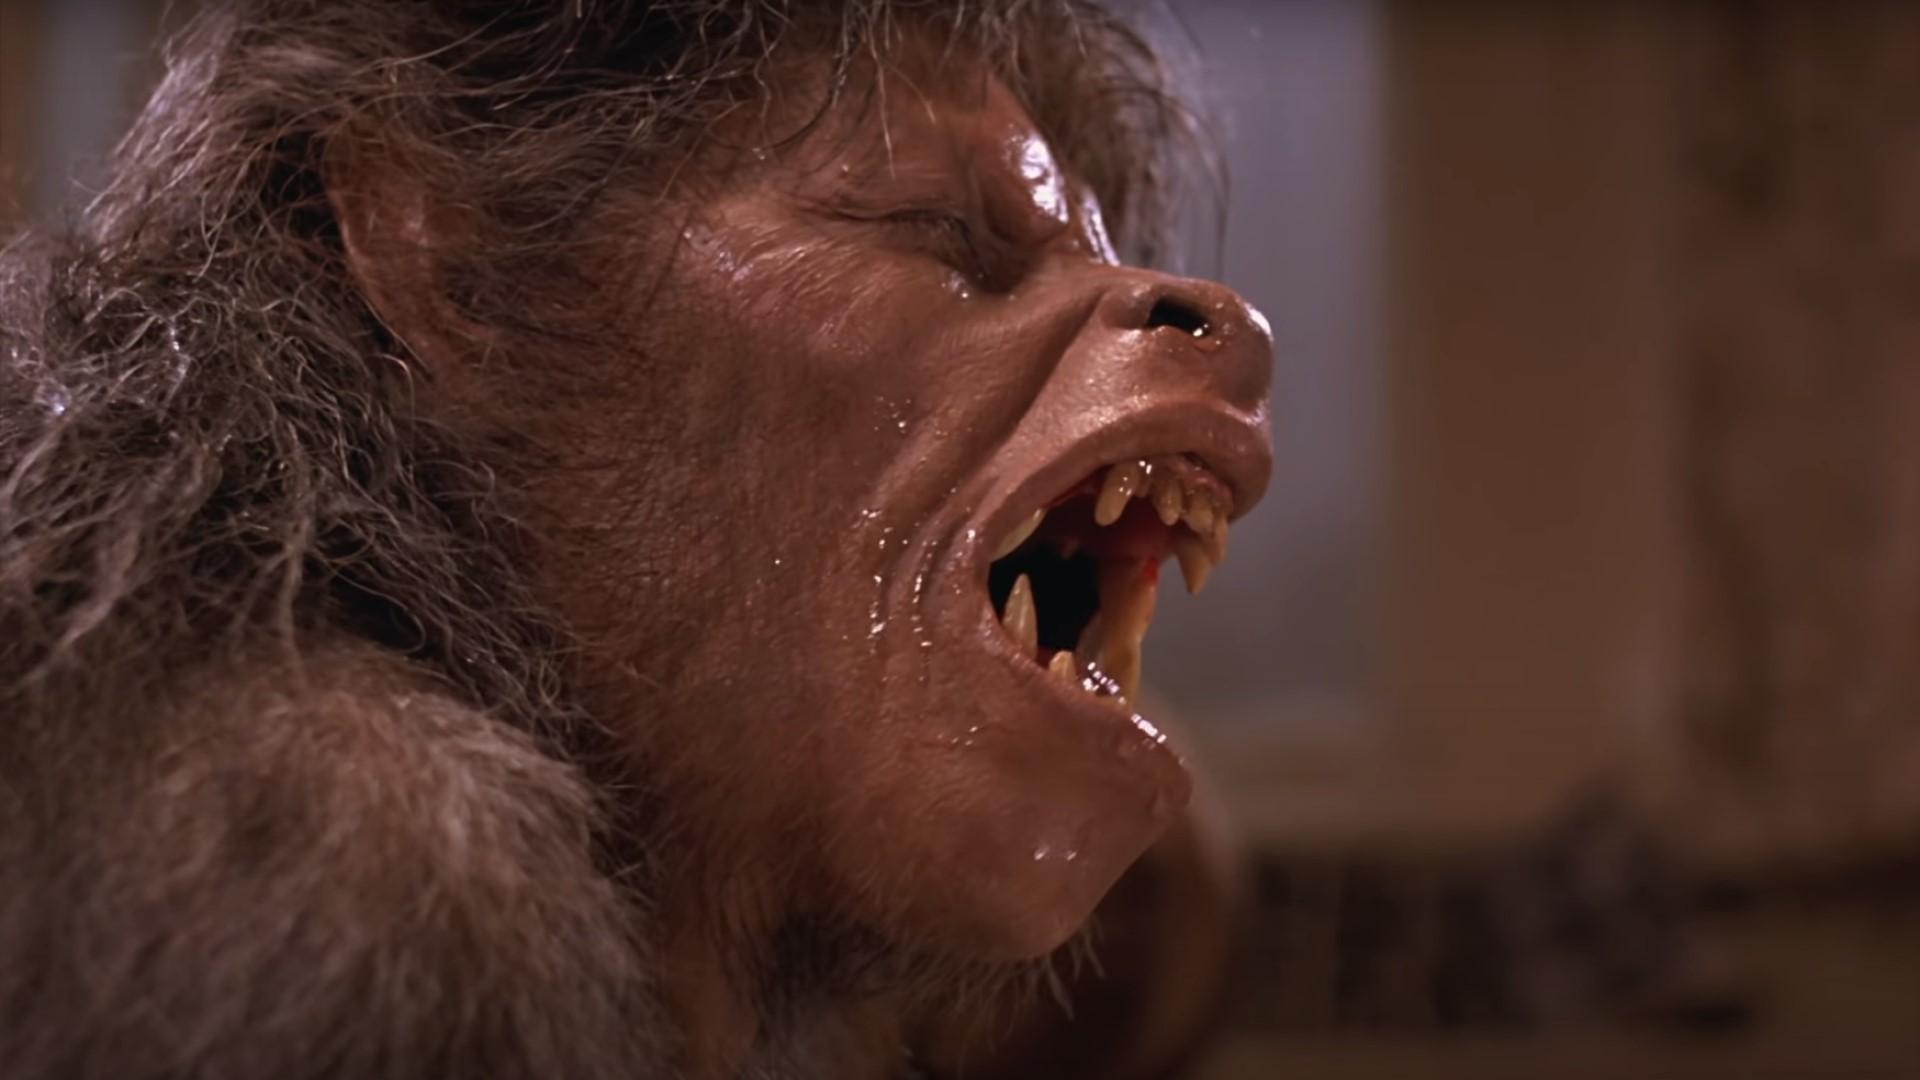 "AN AMERICAN WEREWOLF IN LONDON (1981) - Rick Baker SFX ""Change-O"" Mechanical Werewolf Transformation - Image 23 of 27"